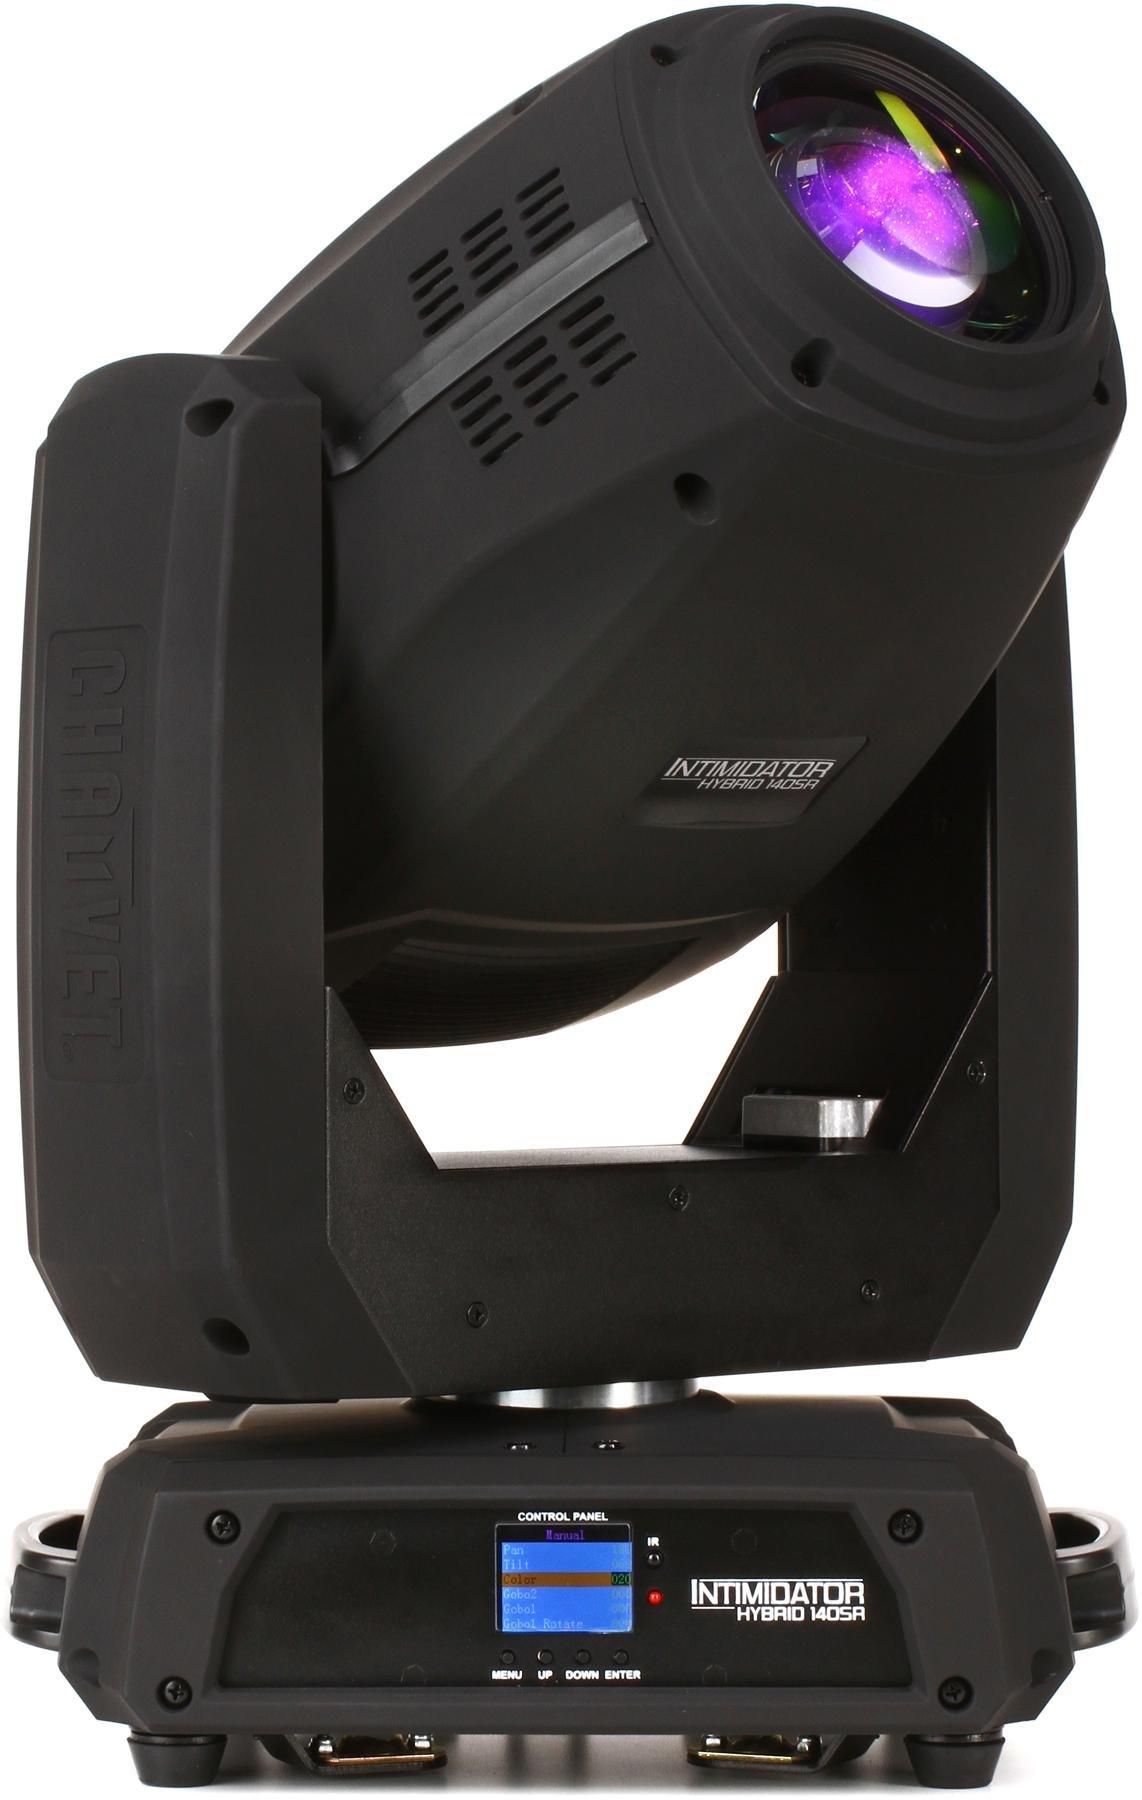 Chauvet dj intimidator hybrid 140sr 140w discharge lamp moving head